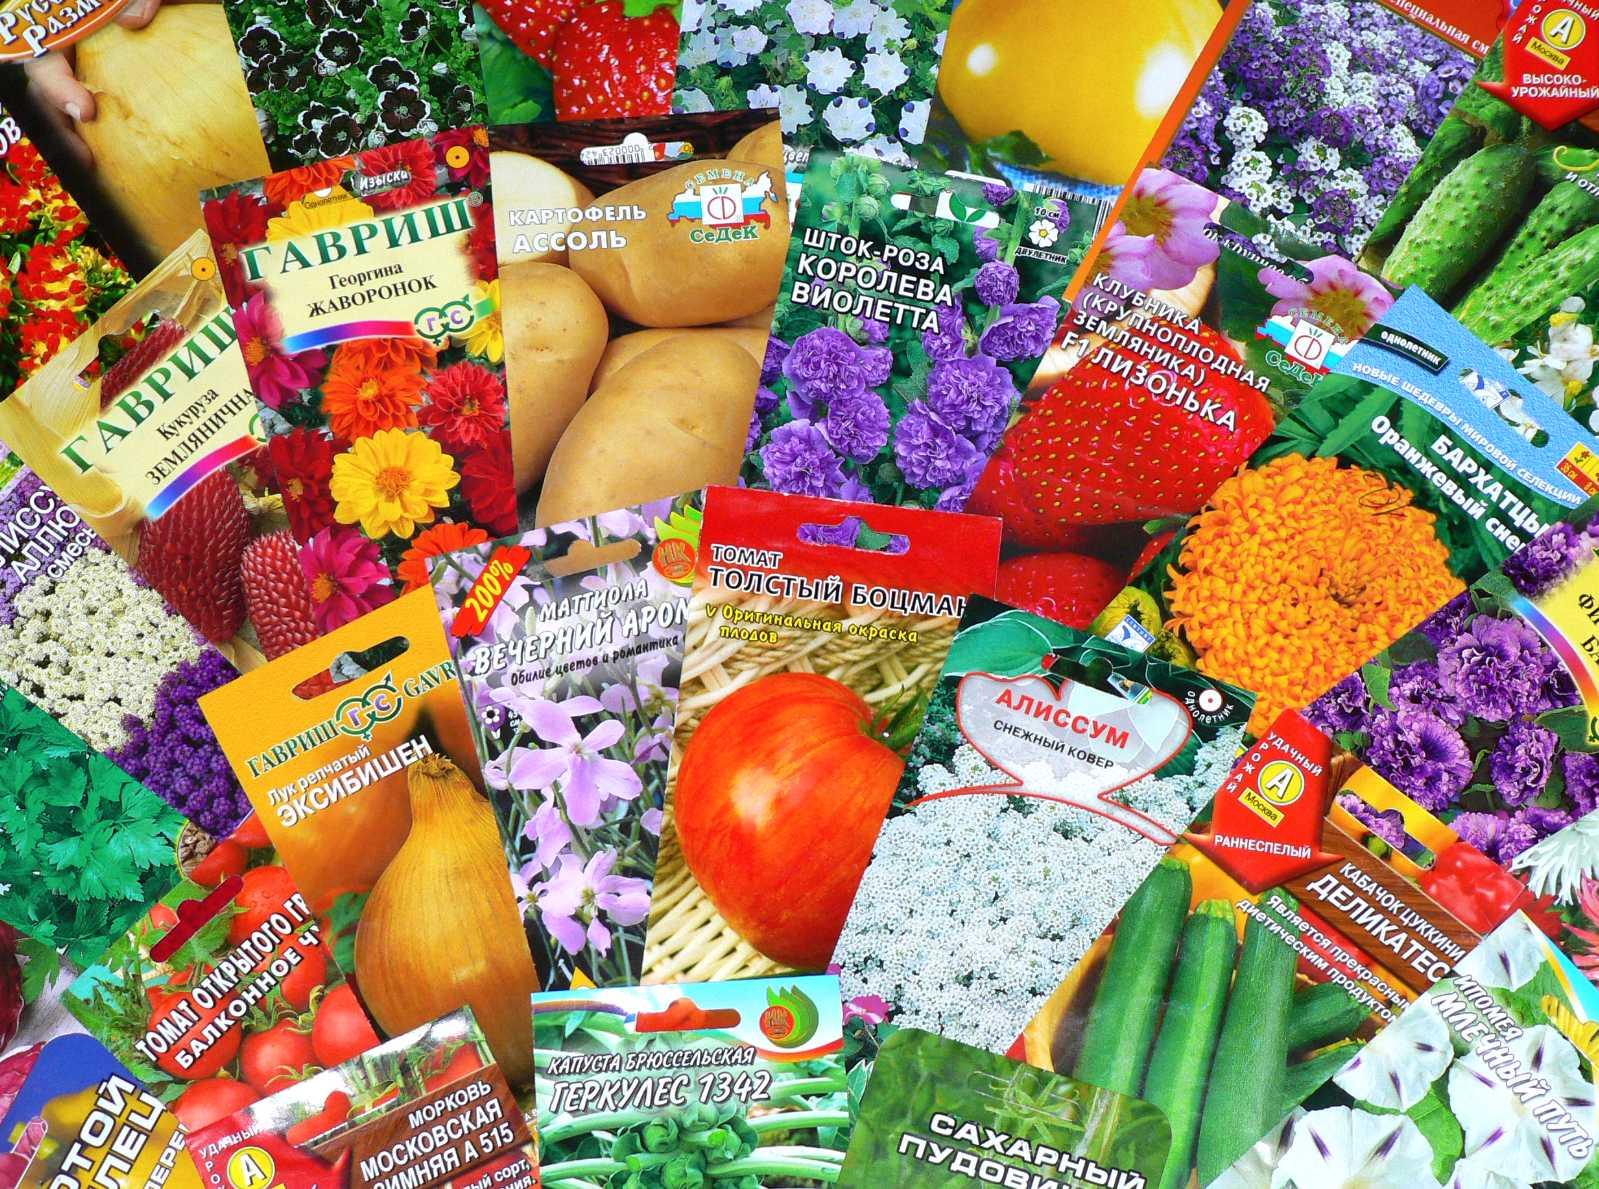 интернет магазин семян